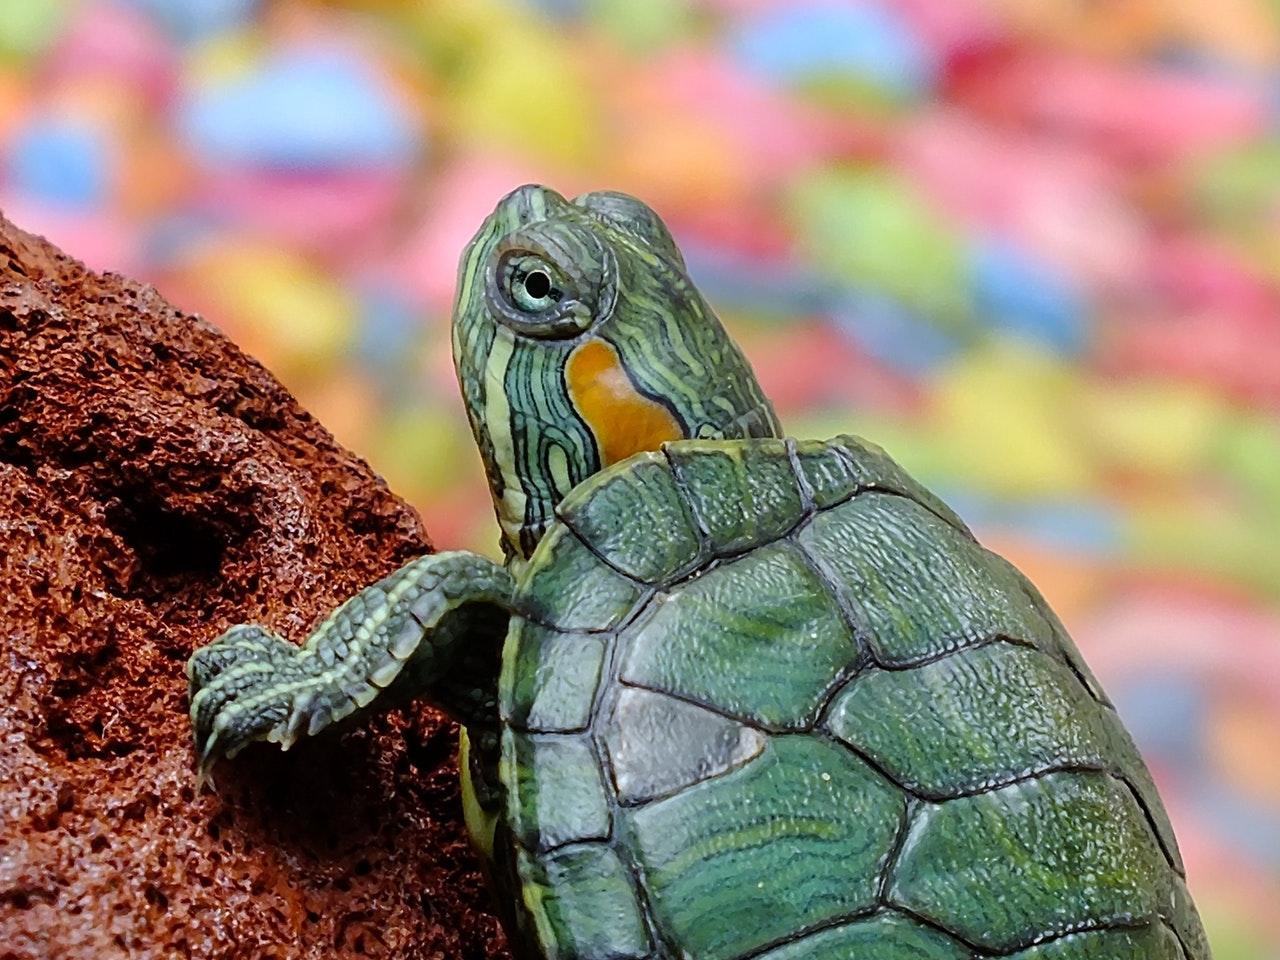 As tartarugas são animais incríveis e resistentes.